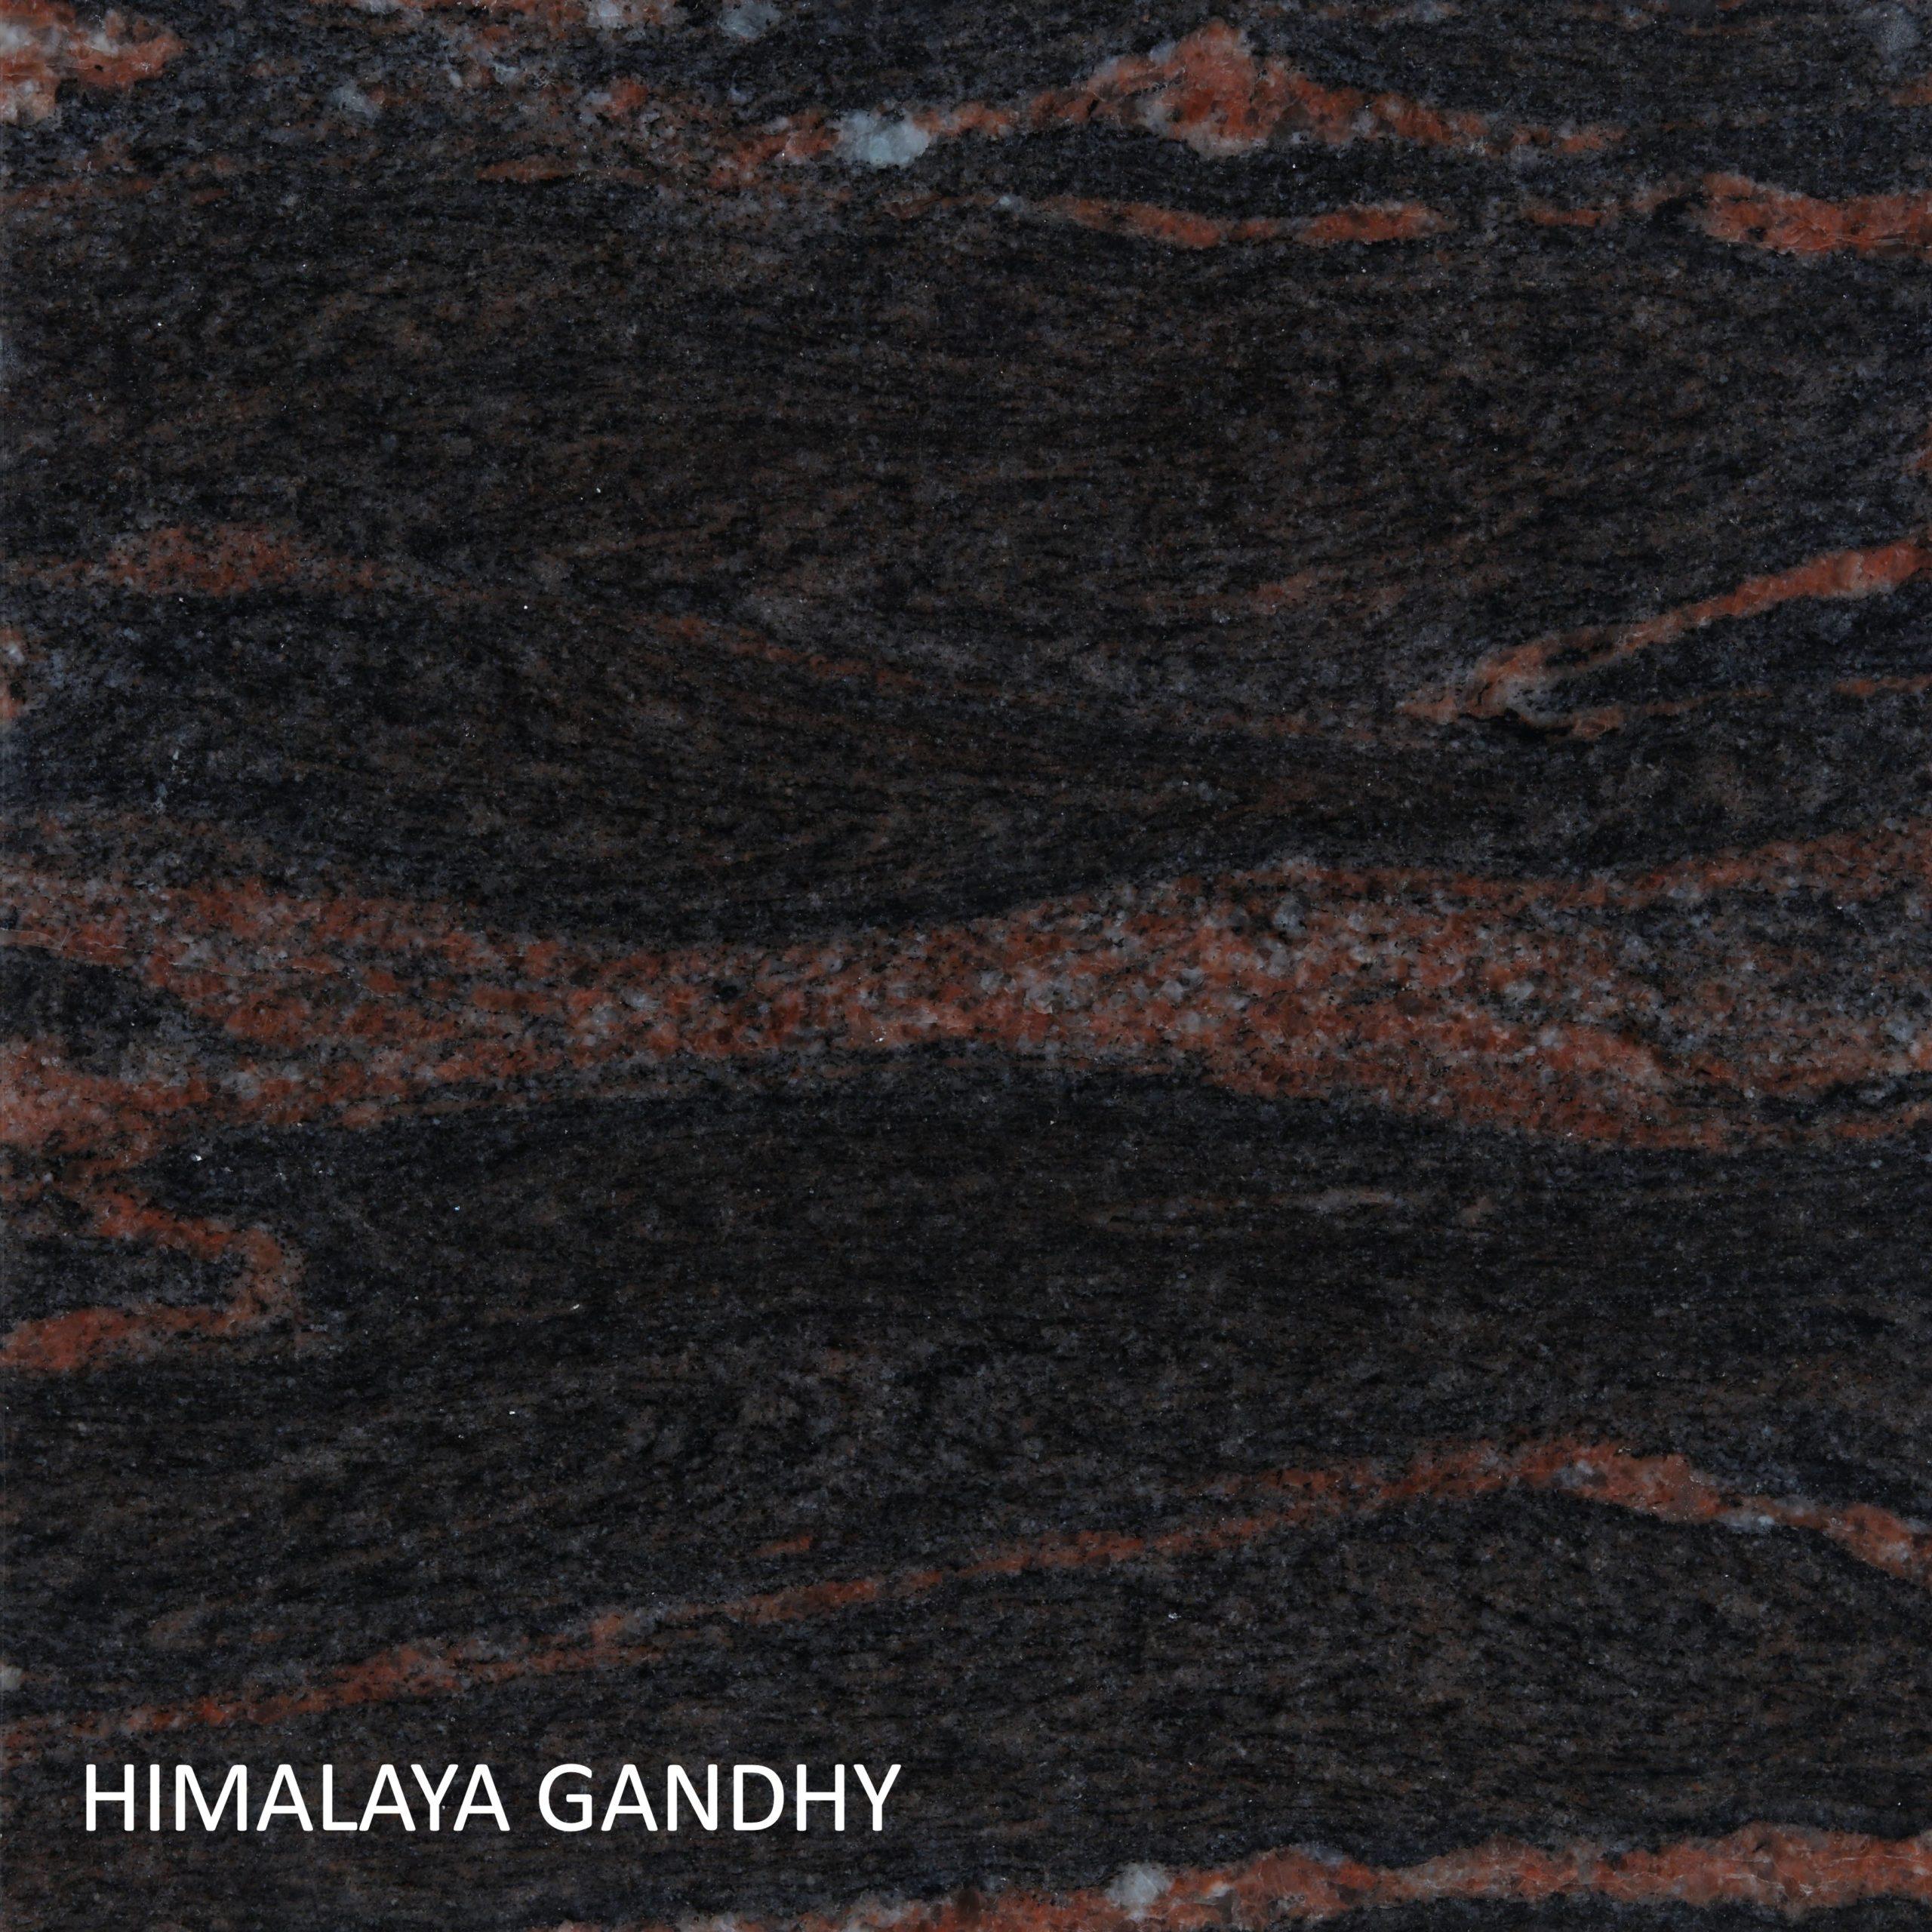 Himalaya-Gandhy